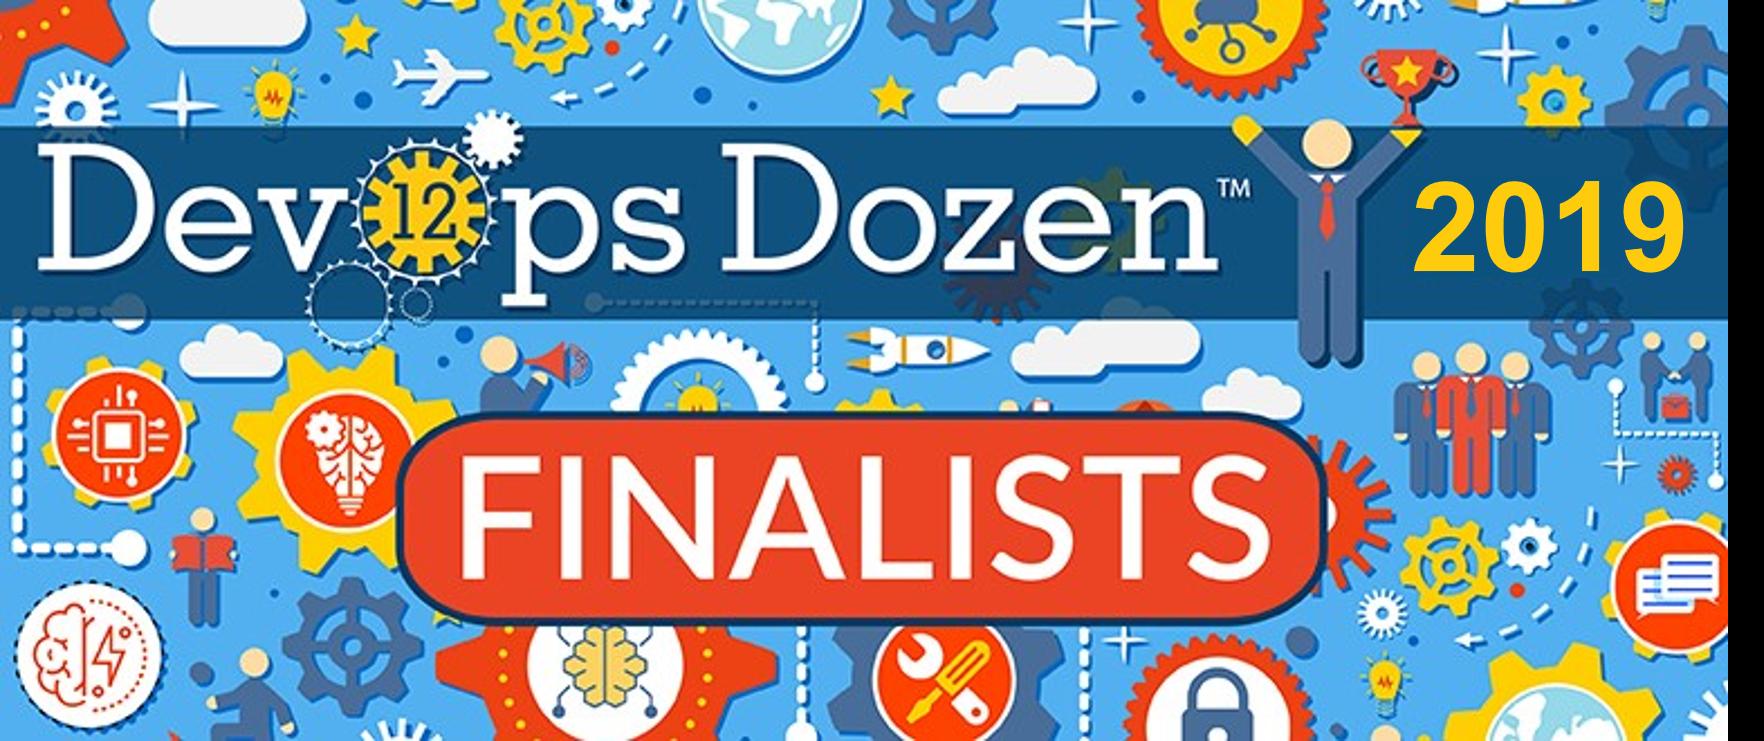 2019 DevOps Dozen Finalists Announced